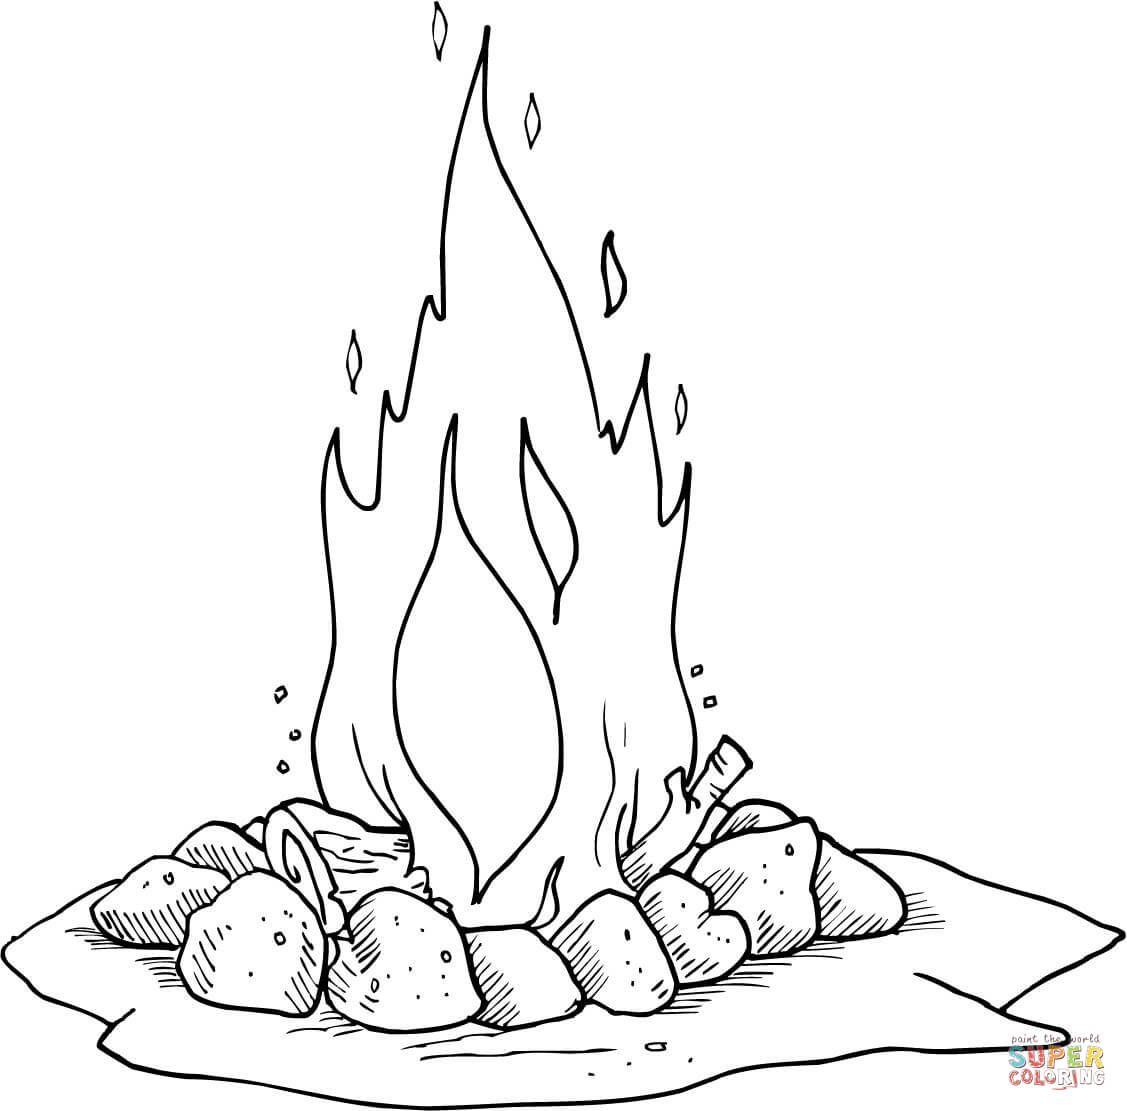 Campfire Coloring Page Coloring Pages Coloring Pages